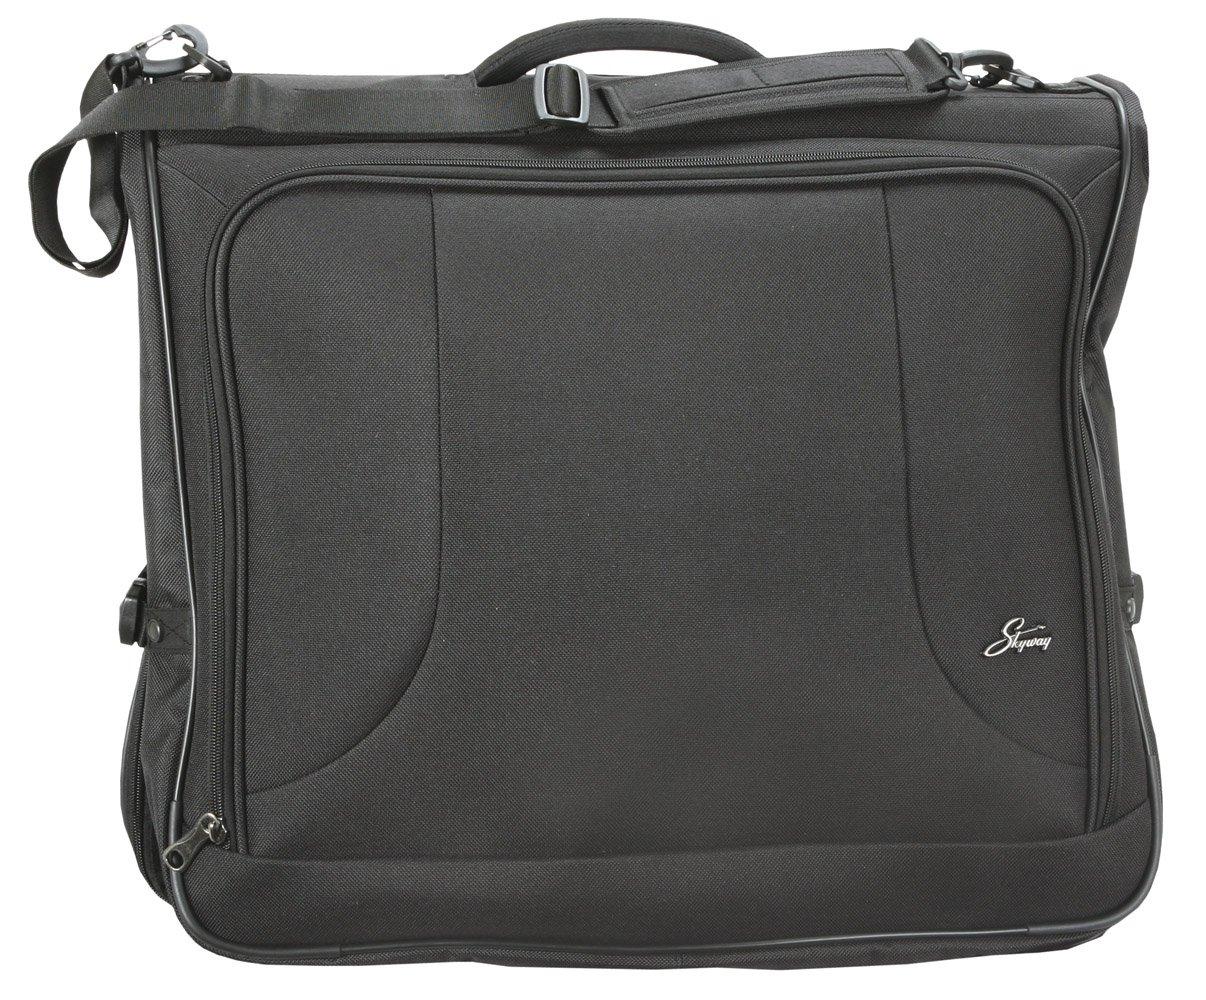 Skyway Luggage Sigma 3 Bifold Garment Bag Skyway Luggage